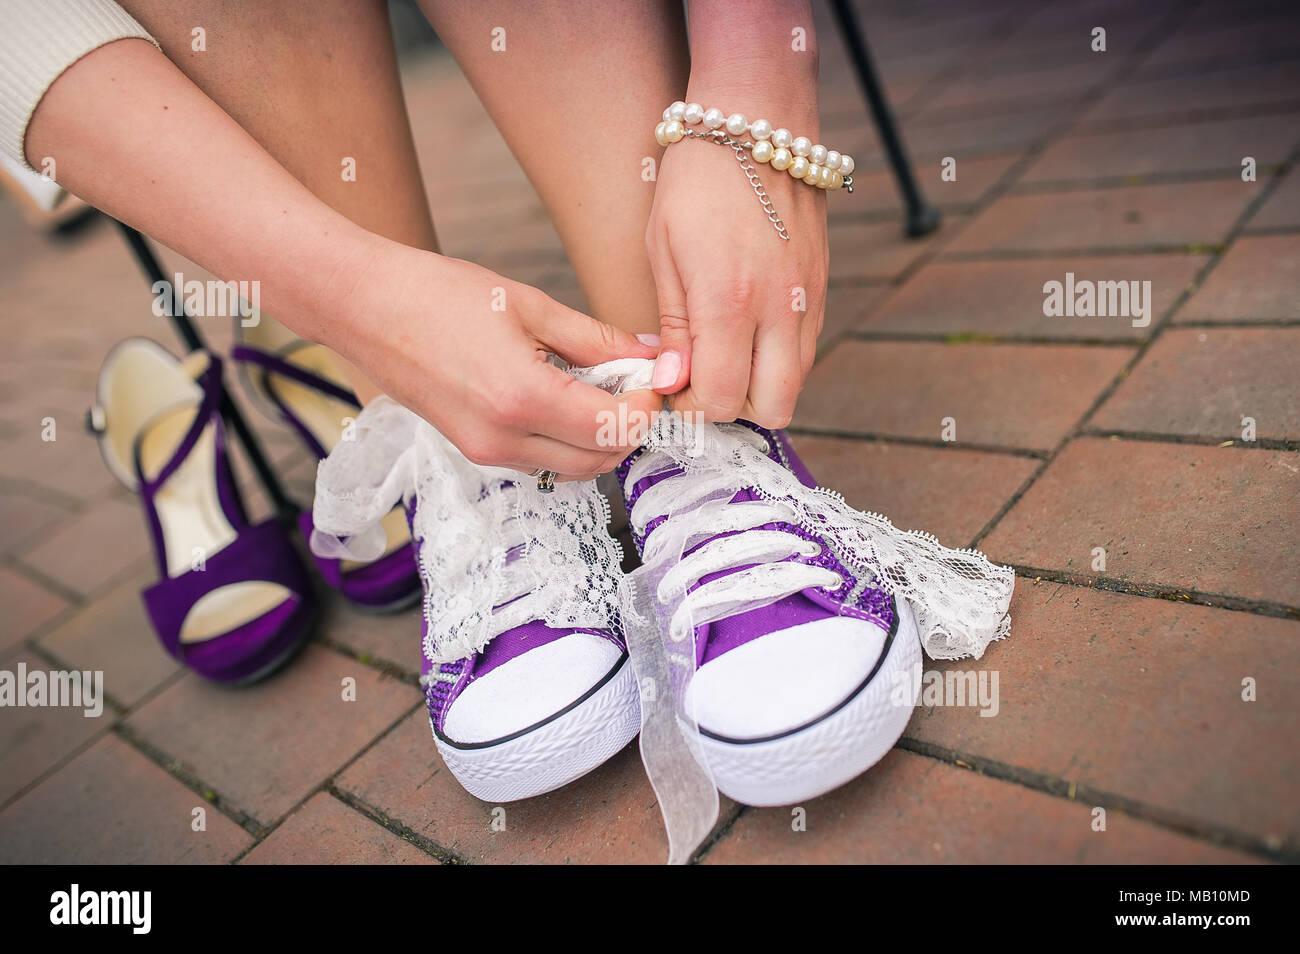 Choosing sneakers over high heels Stock